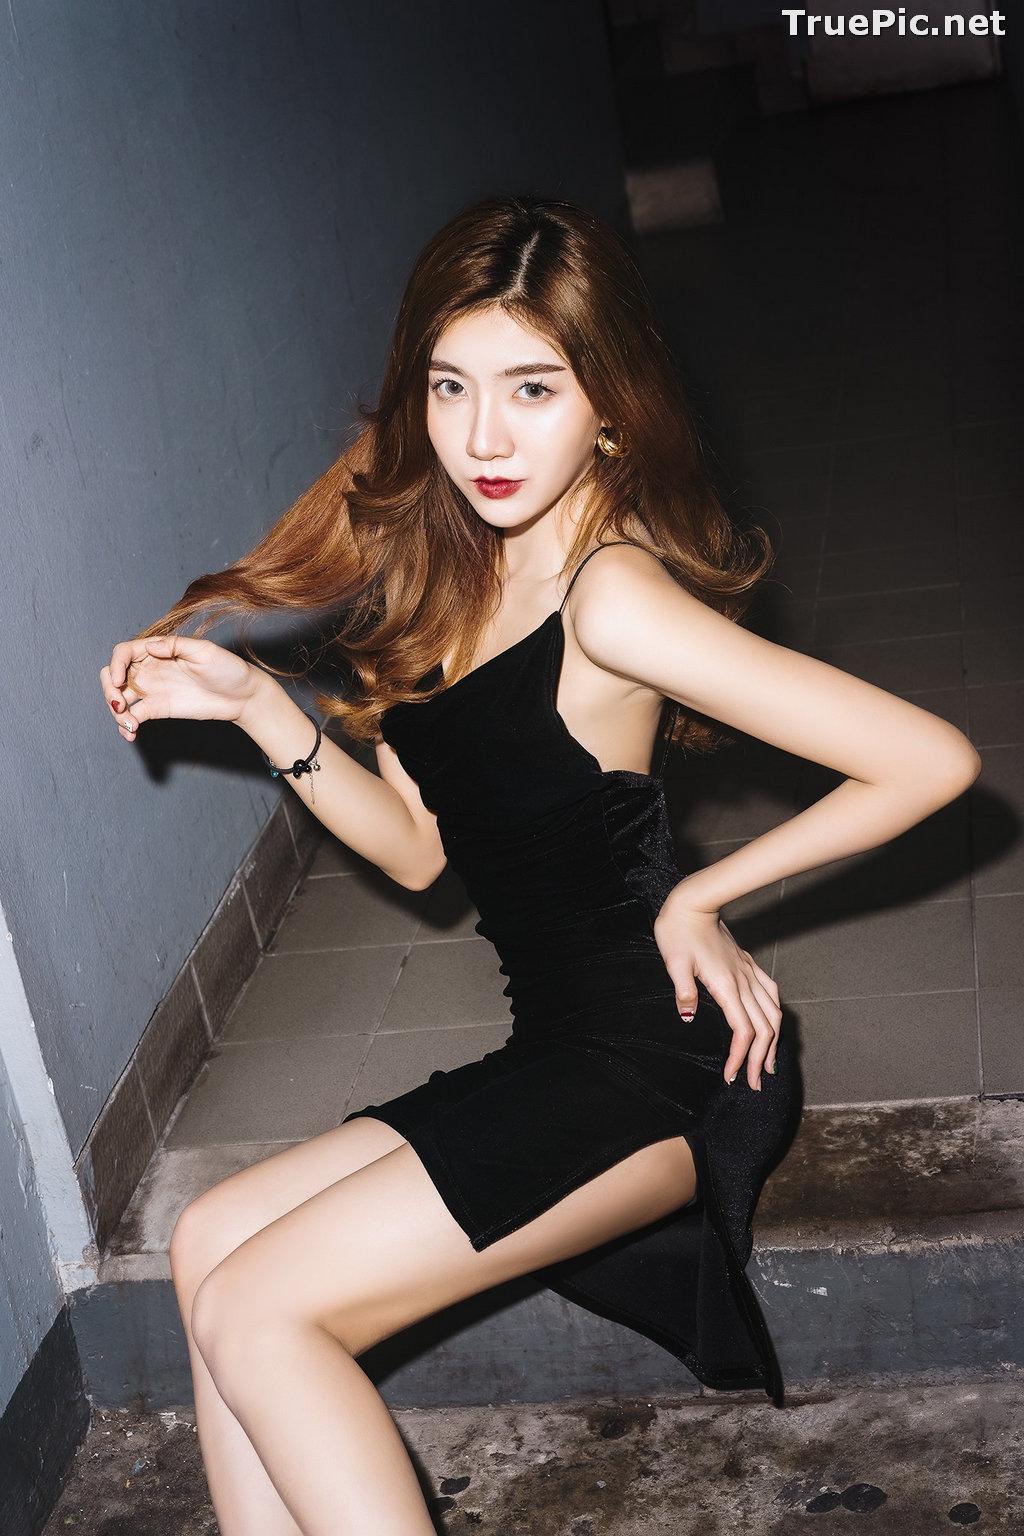 Image Thailand Model - Sasi Ngiunwan - Black For SiamNight - TruePic.net - Picture-37